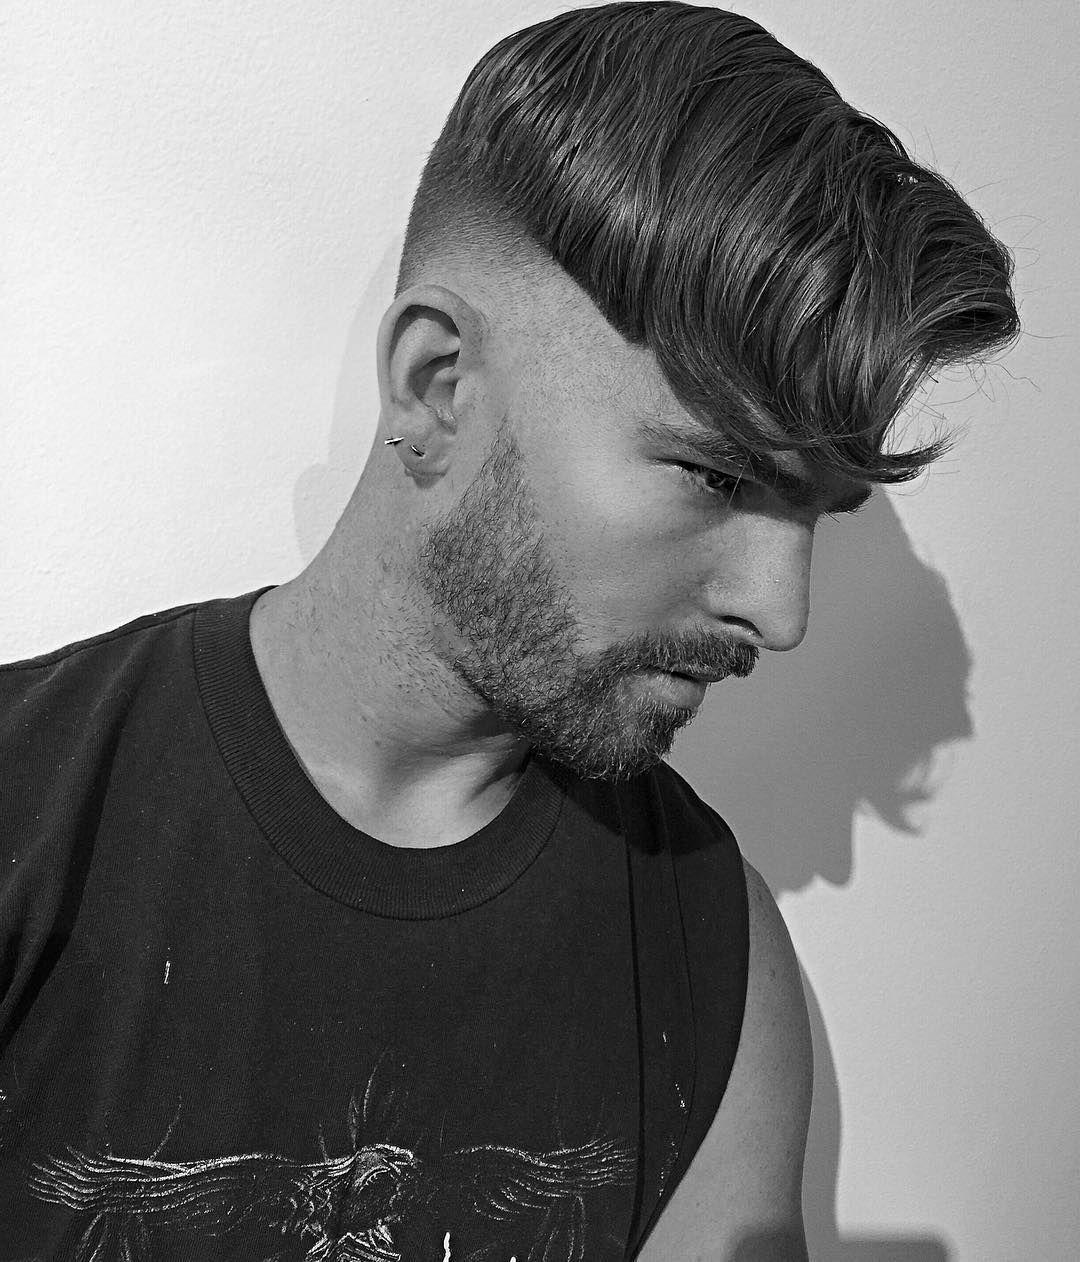 New Undercut Hairstyles For Men Haircuts Undercut And - Undercut hairstyle diy